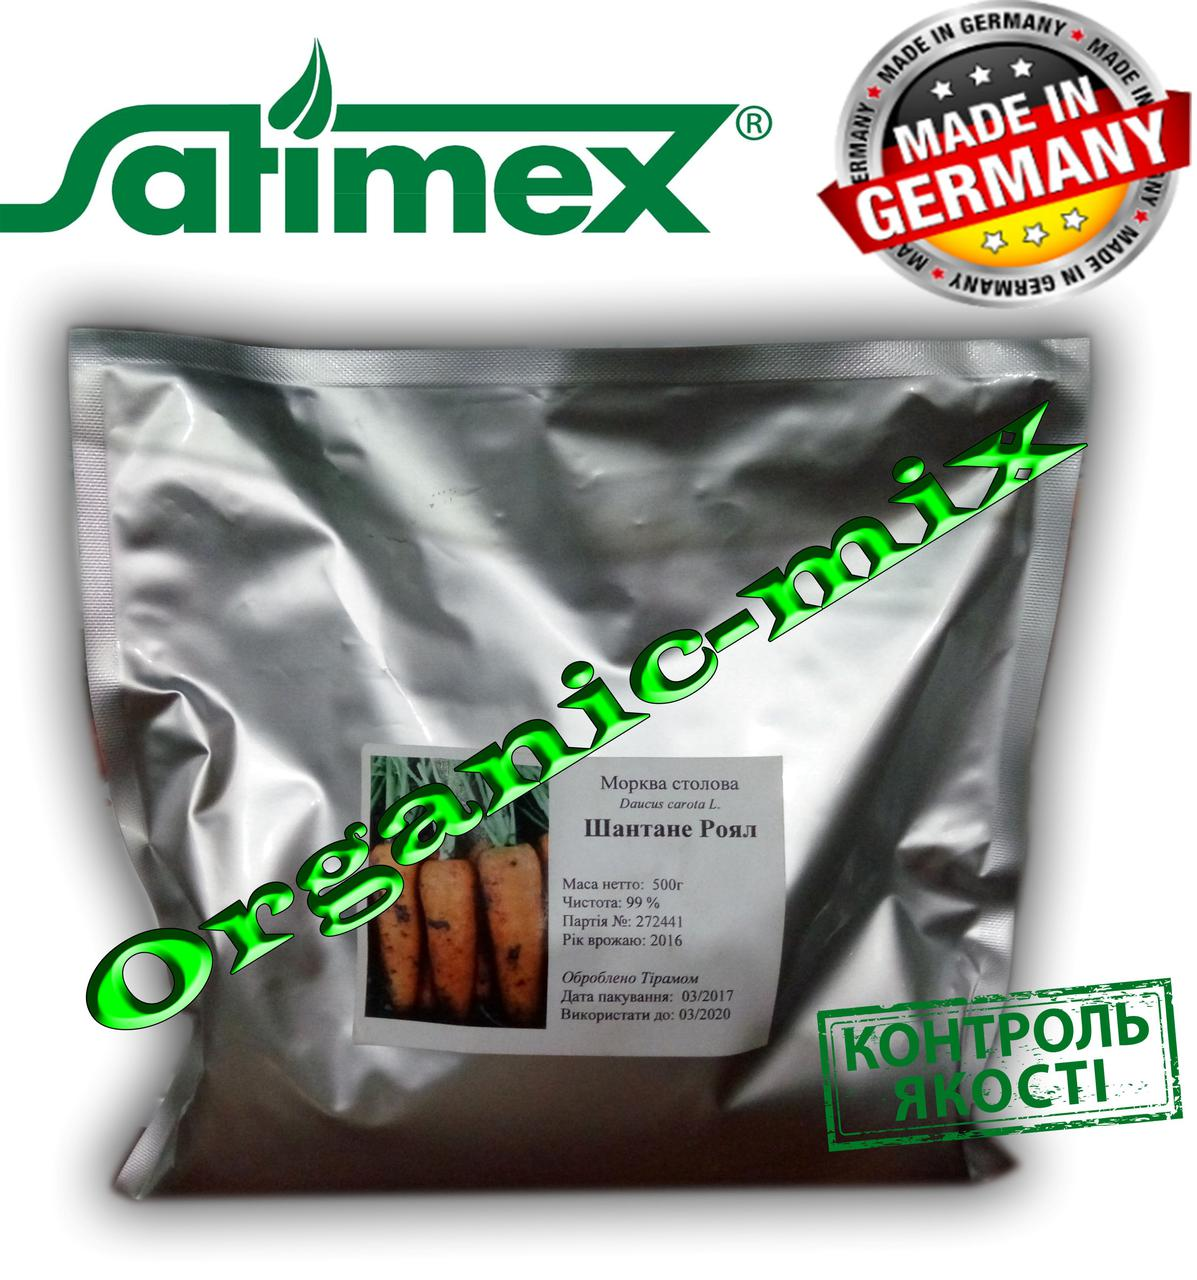 Морковь средне поздняя Шантане Роял ТМ Satimex (Германия), проф. пакет 500 грамм